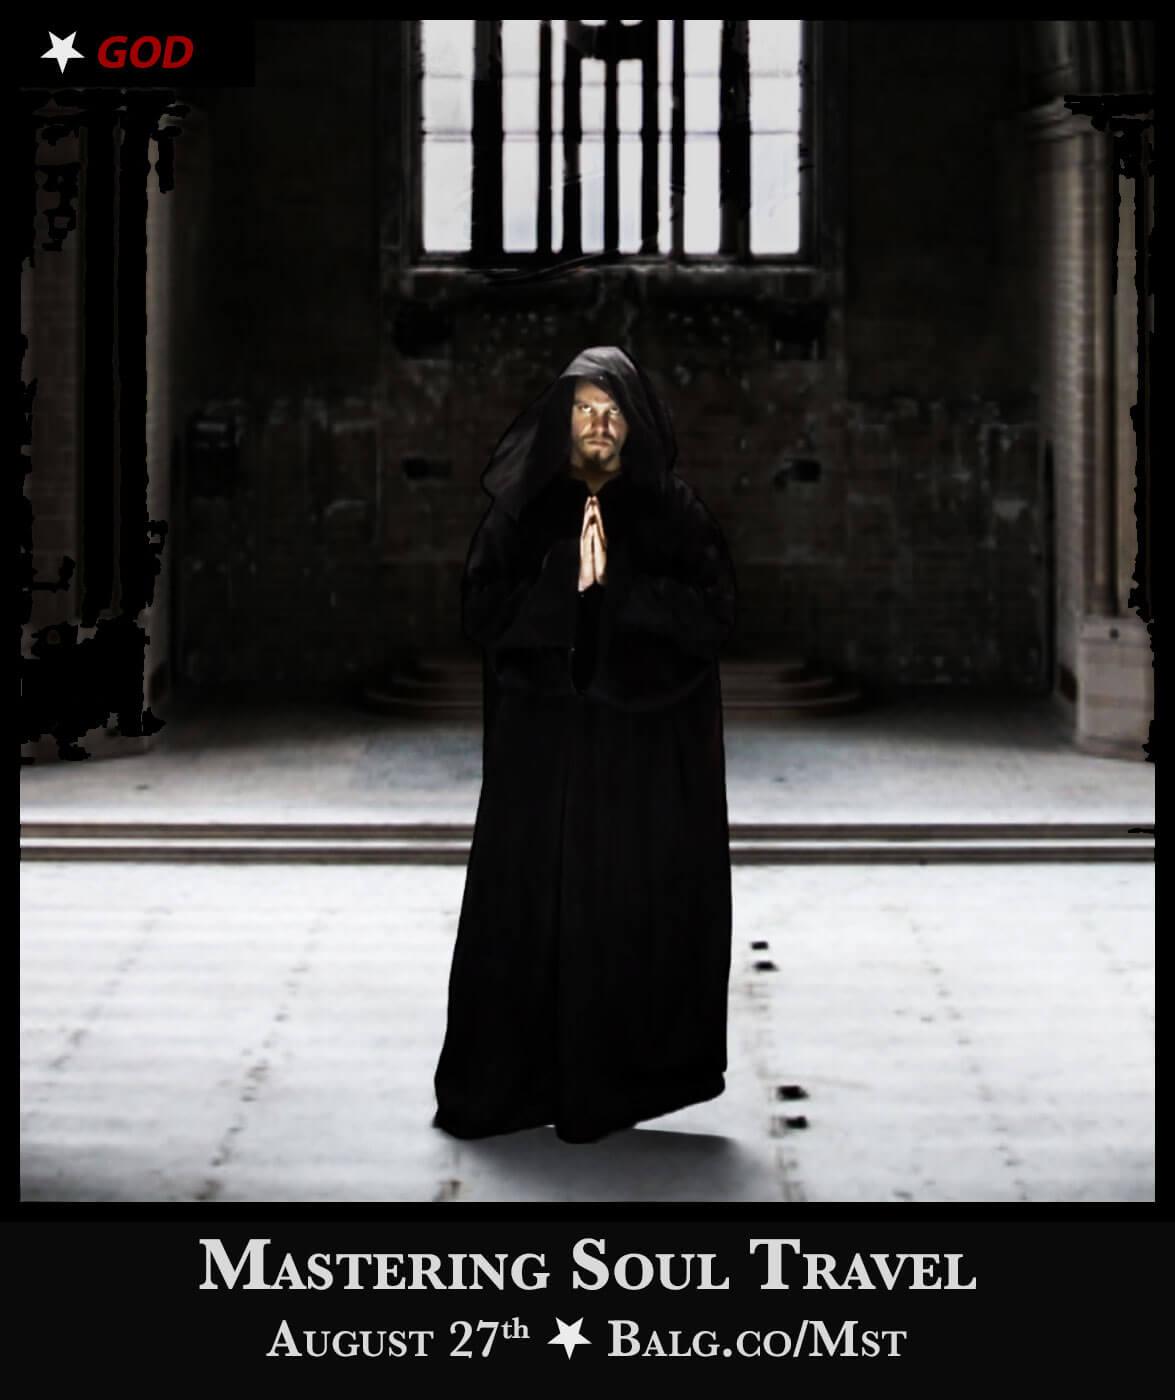 Mastering Soul Travel, E.A. Koetting